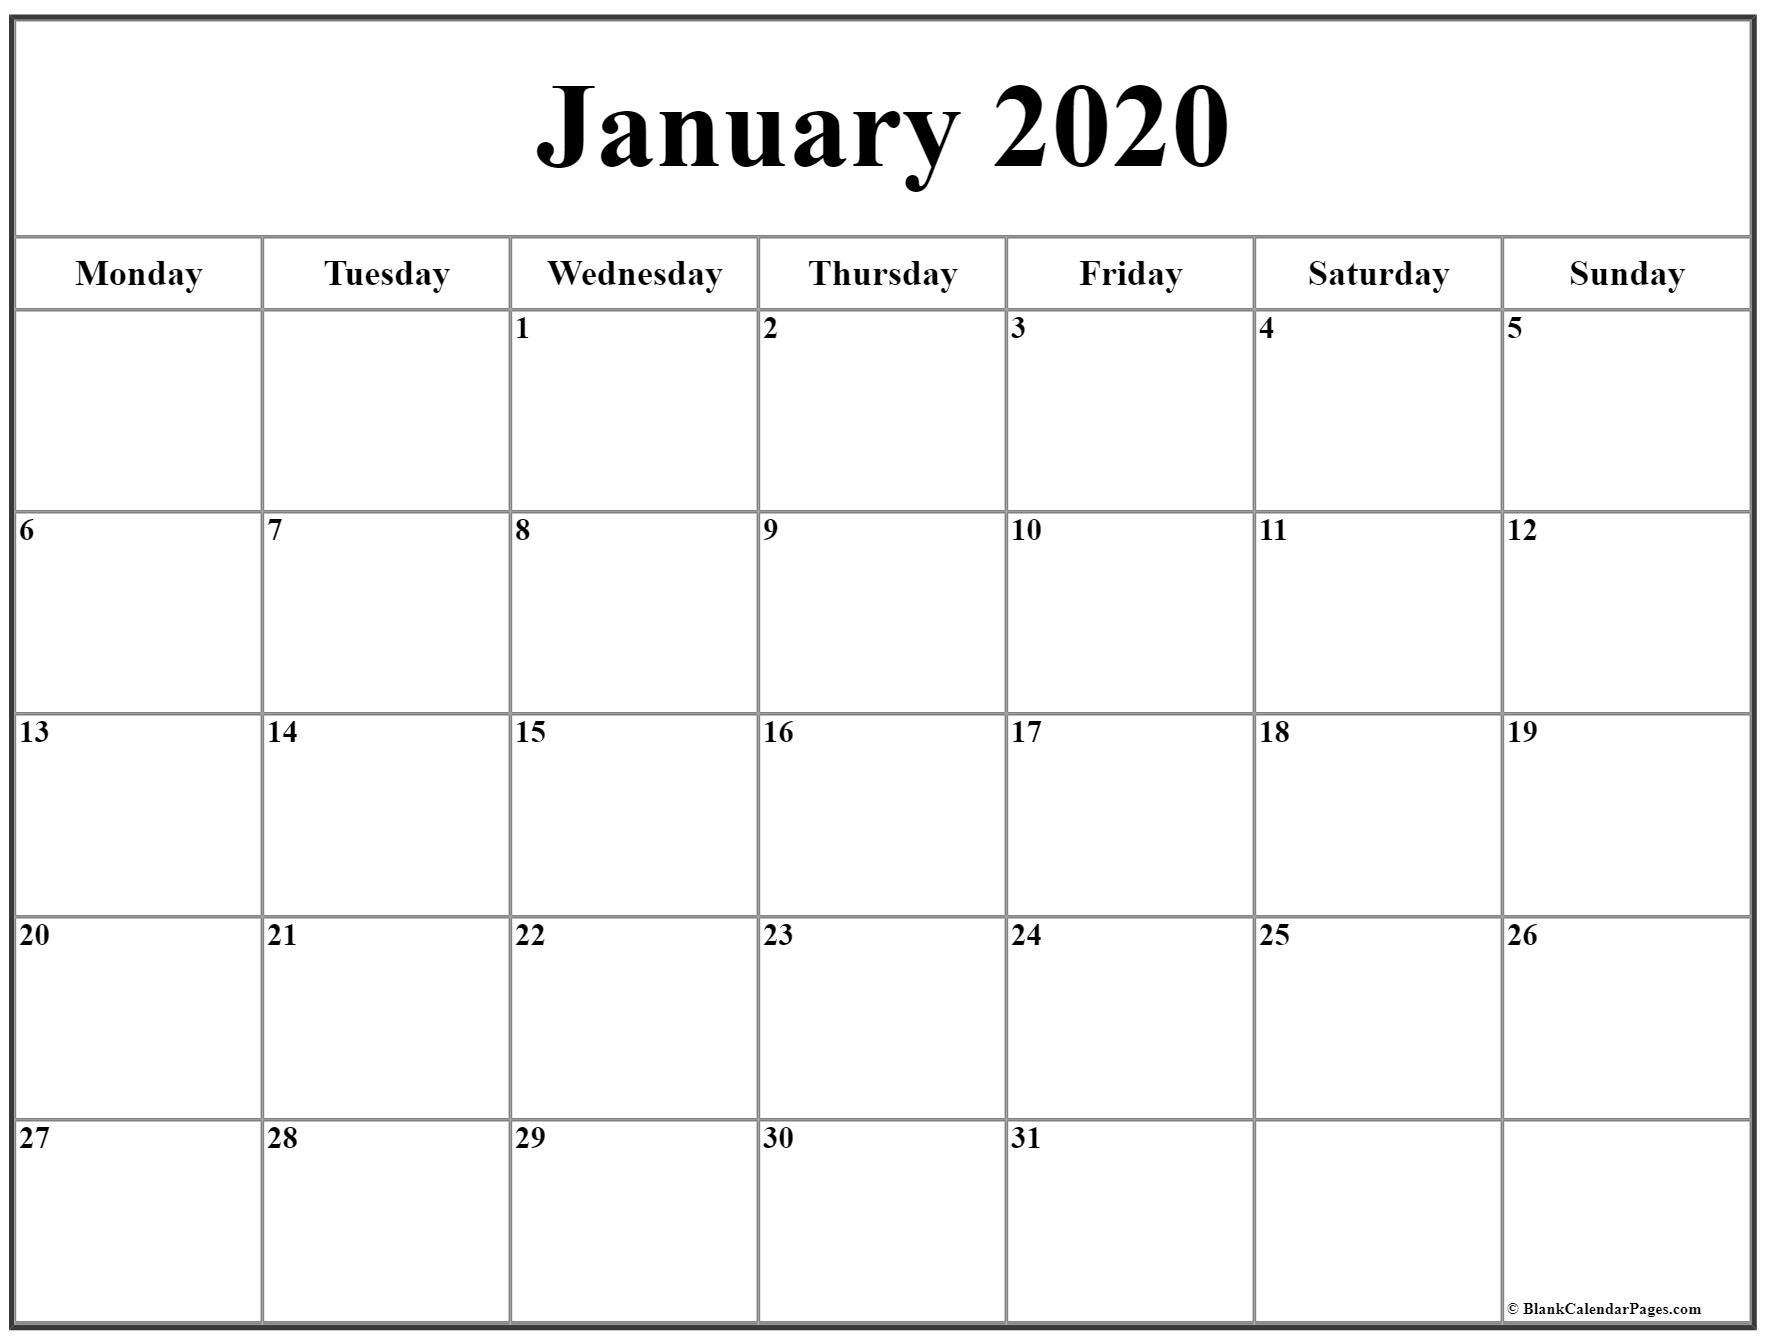 January 2020 Monday Calendar | Monday To Sunday in January 2020 Calendar Starting Monday